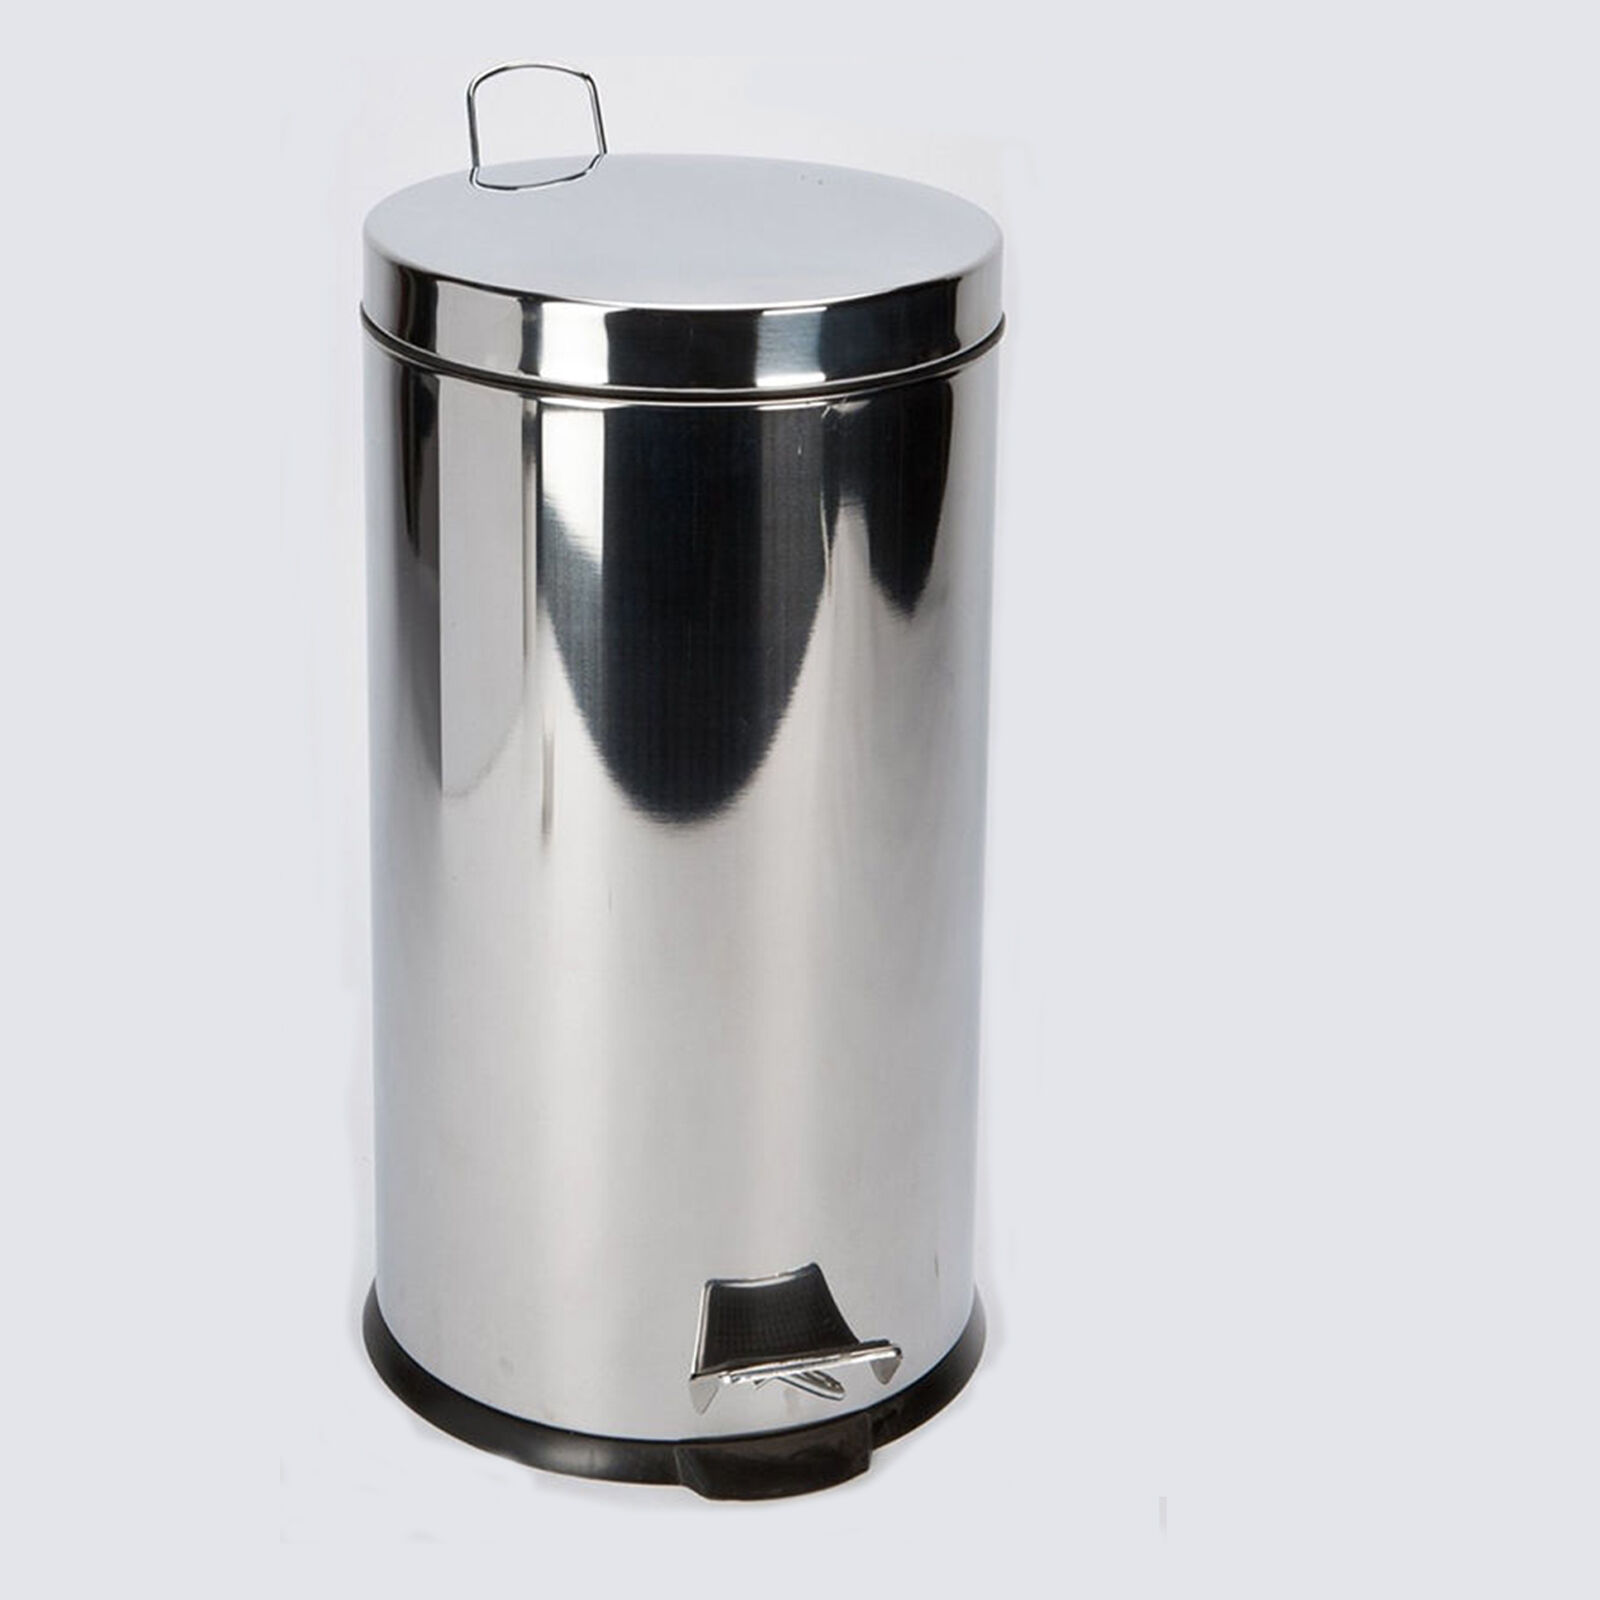 Steel Waste Pedal Bin Kitchen Bathroom Household Rubbish Dustbin 3L 5L 20 L 30 L